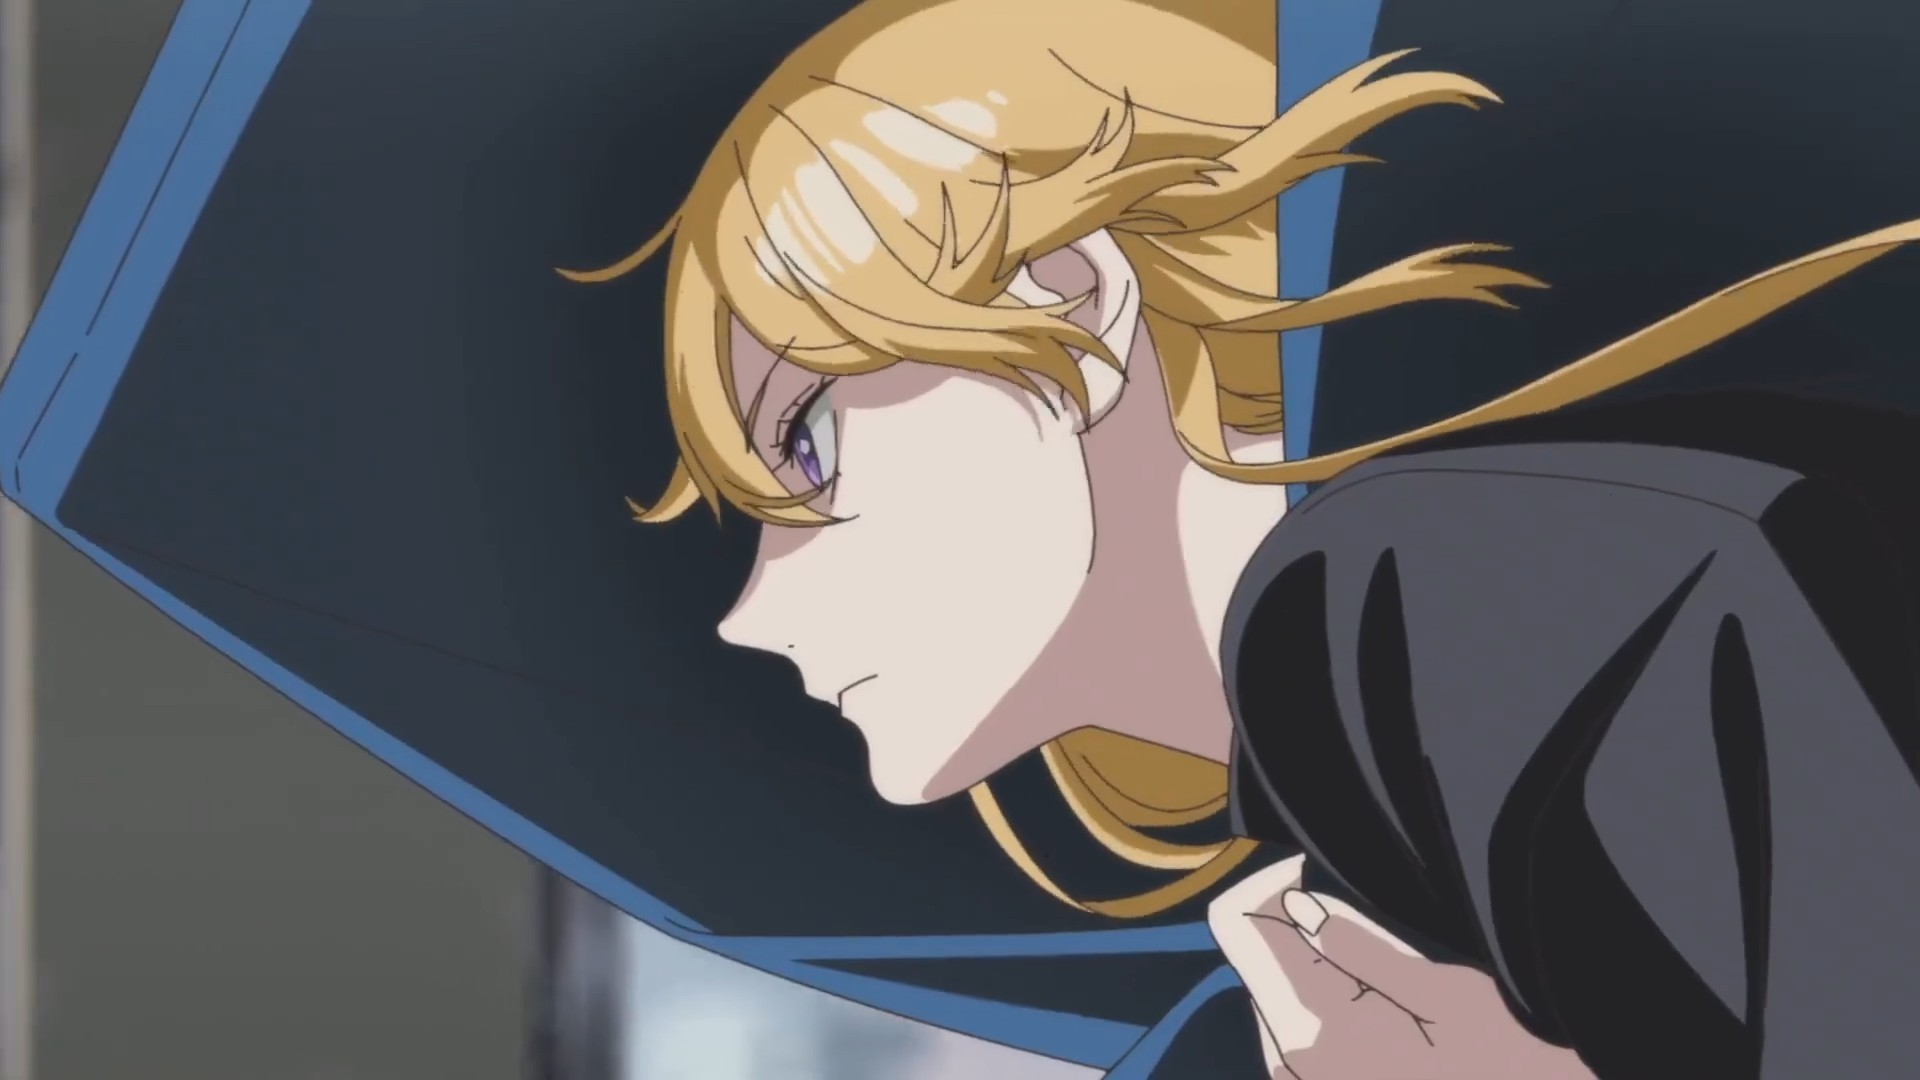 TV动画《蓝色时期》第一弹PV公开,2021年10月播出- 布丁次元社